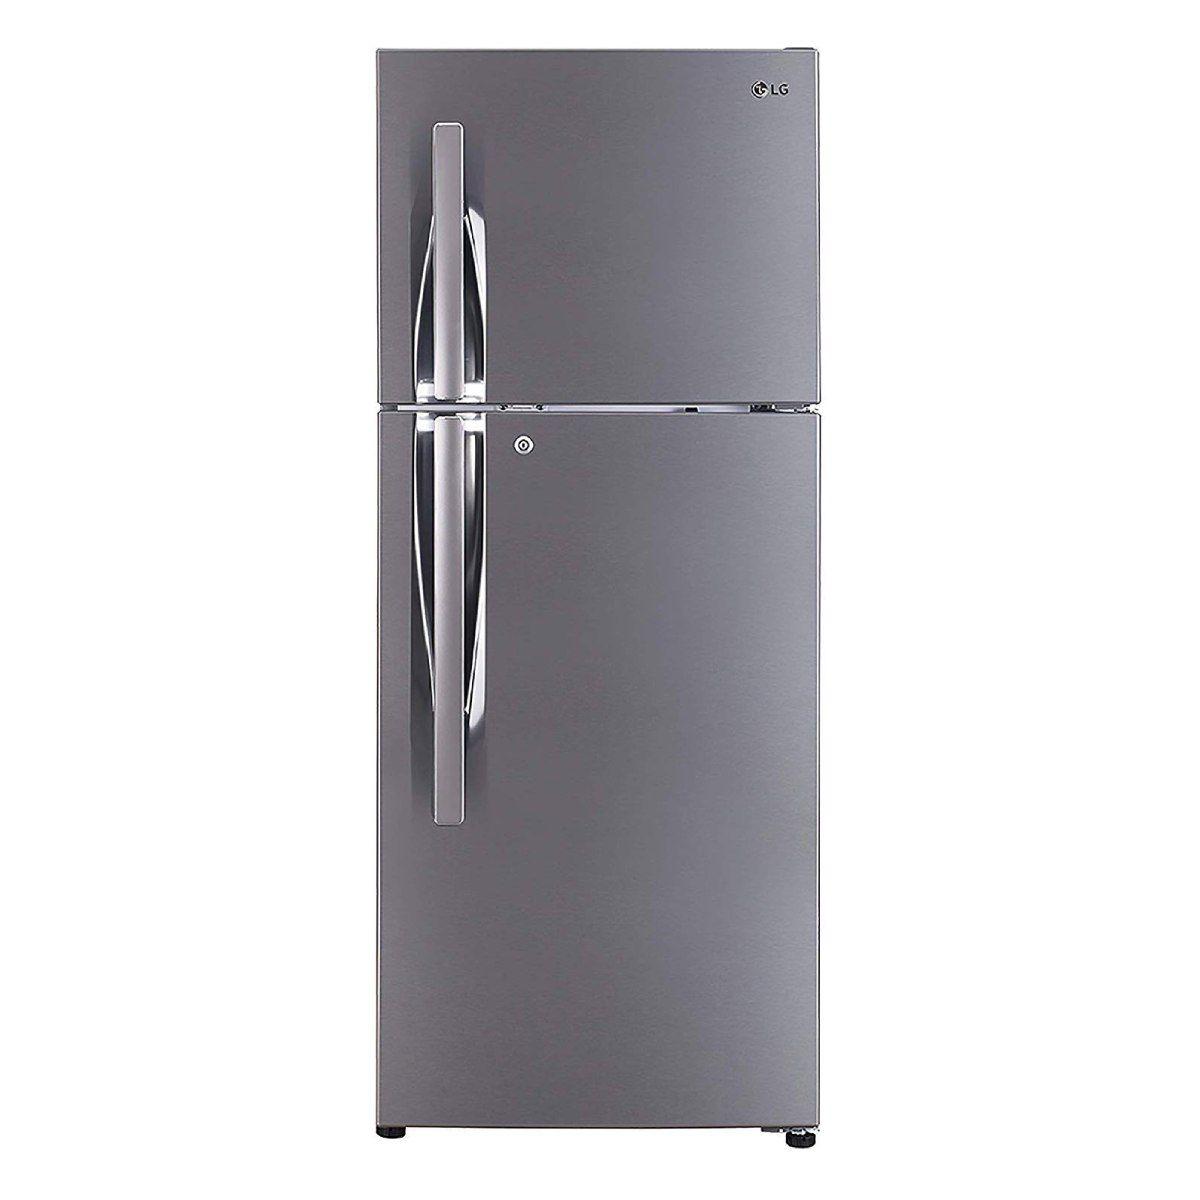 LG 260 L 3 Star Double Door Refrigerator (GL-I292RPZL)